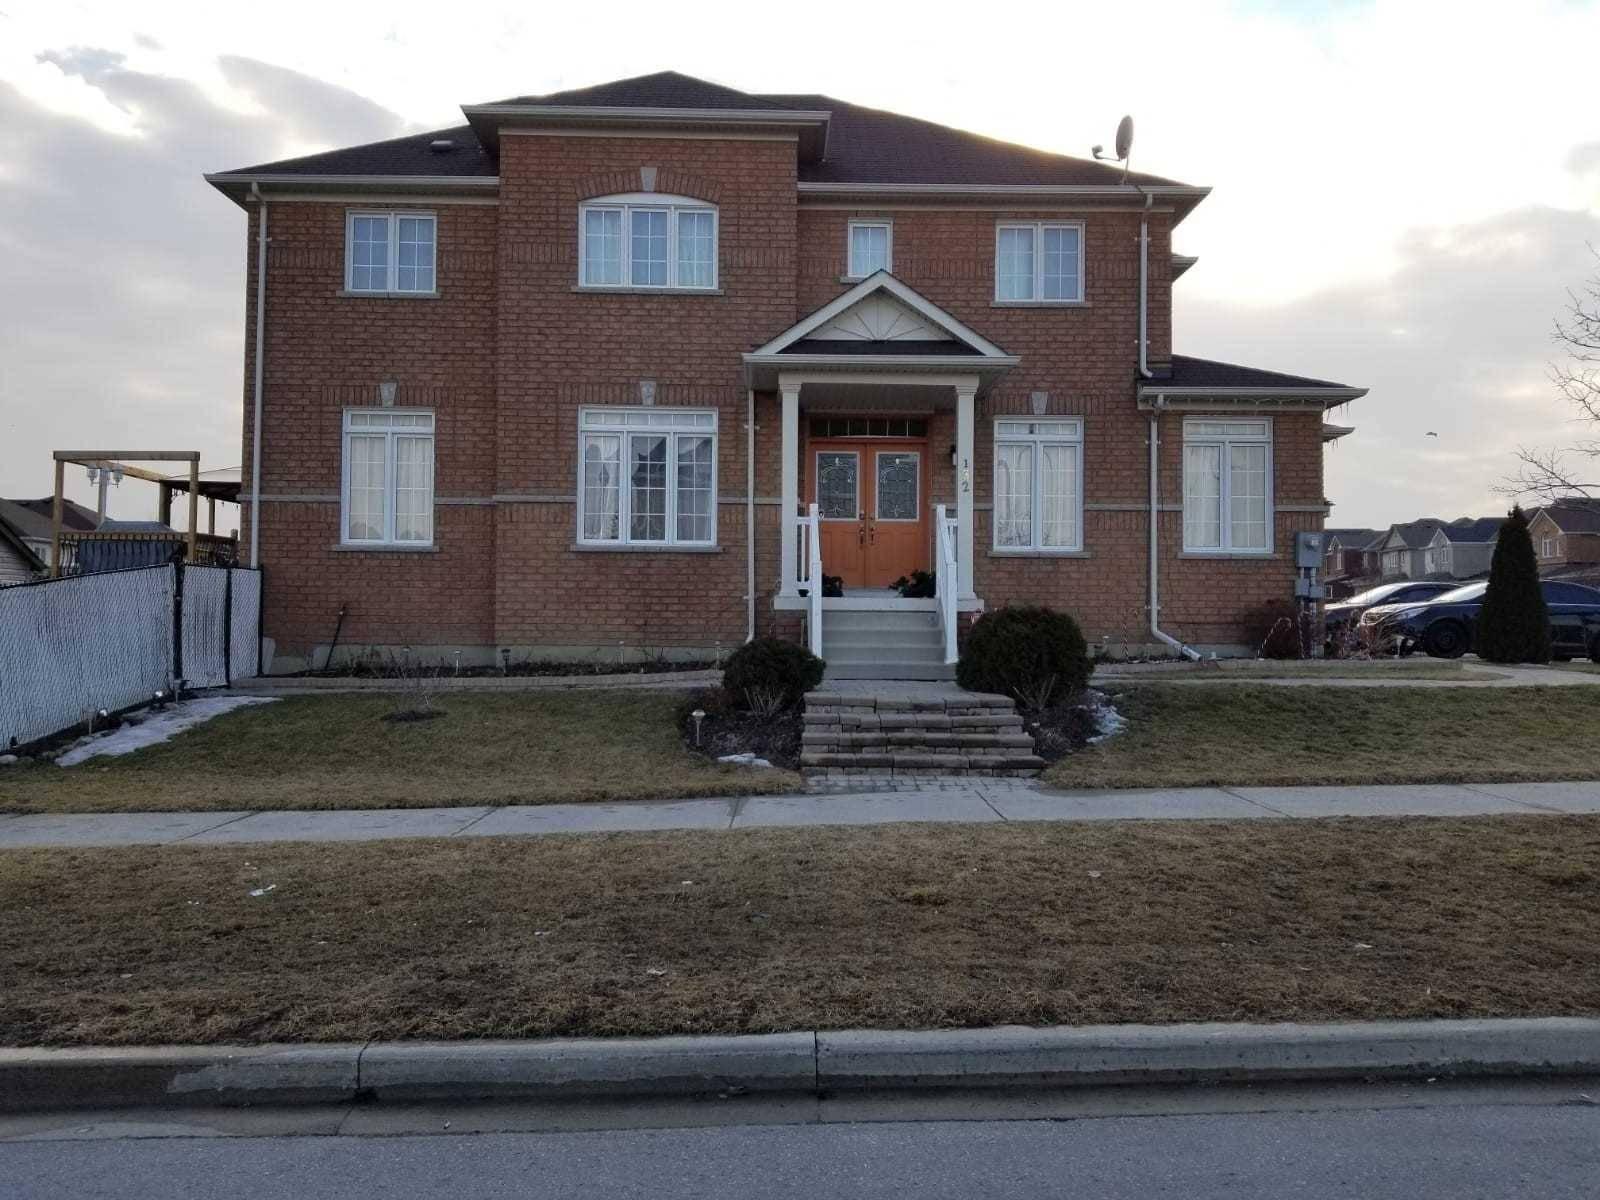 House for sale at 132 Swindells St Clarington Ontario - MLS: E4390591